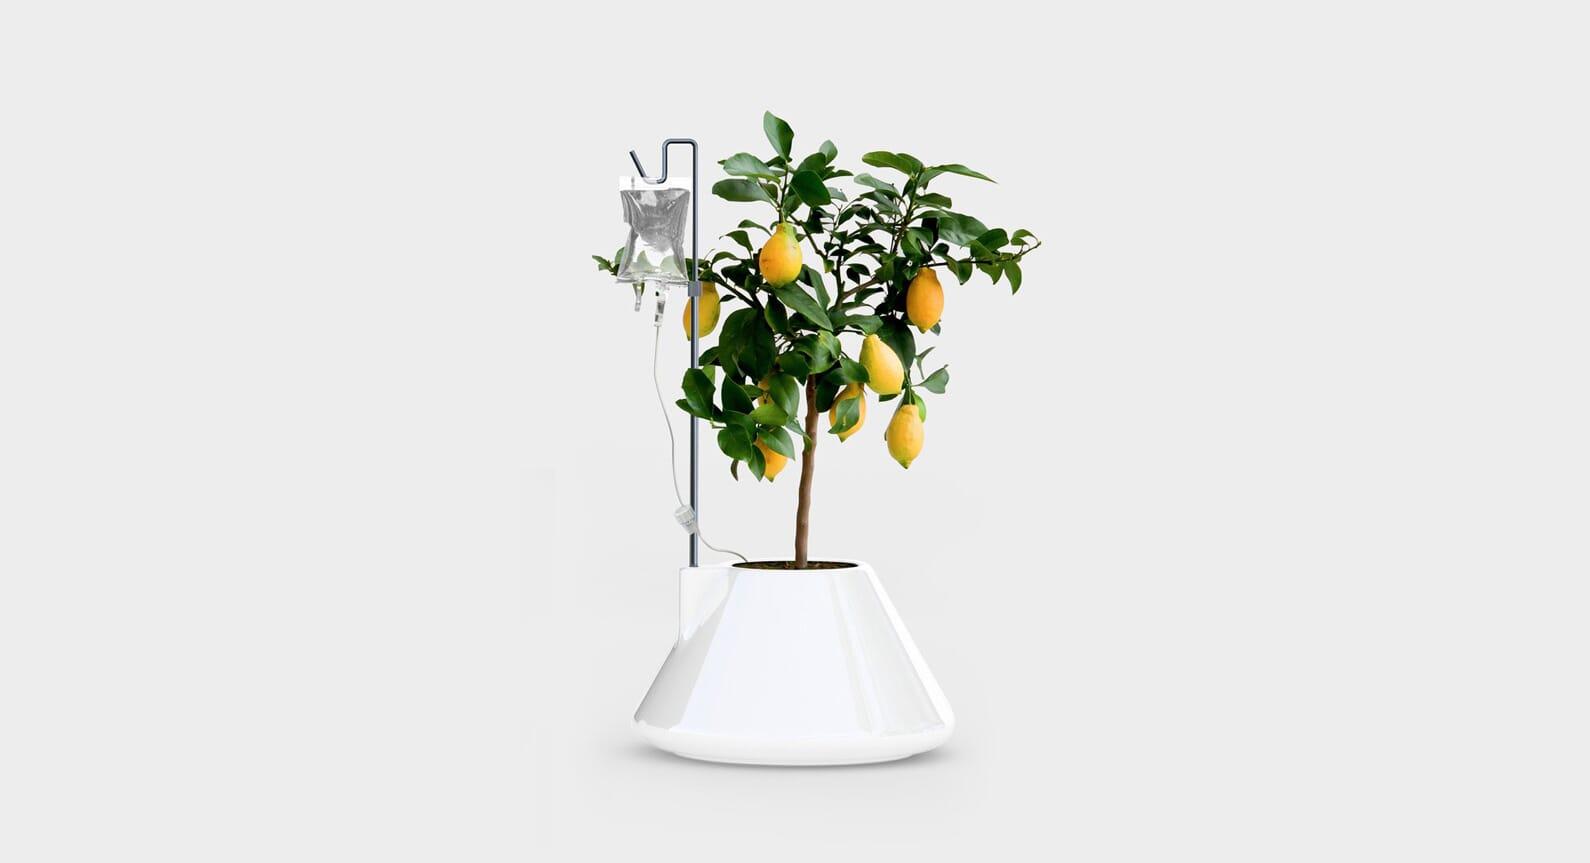 Vitamin Launches A New Range Of Furniture, Lighting & Homeware